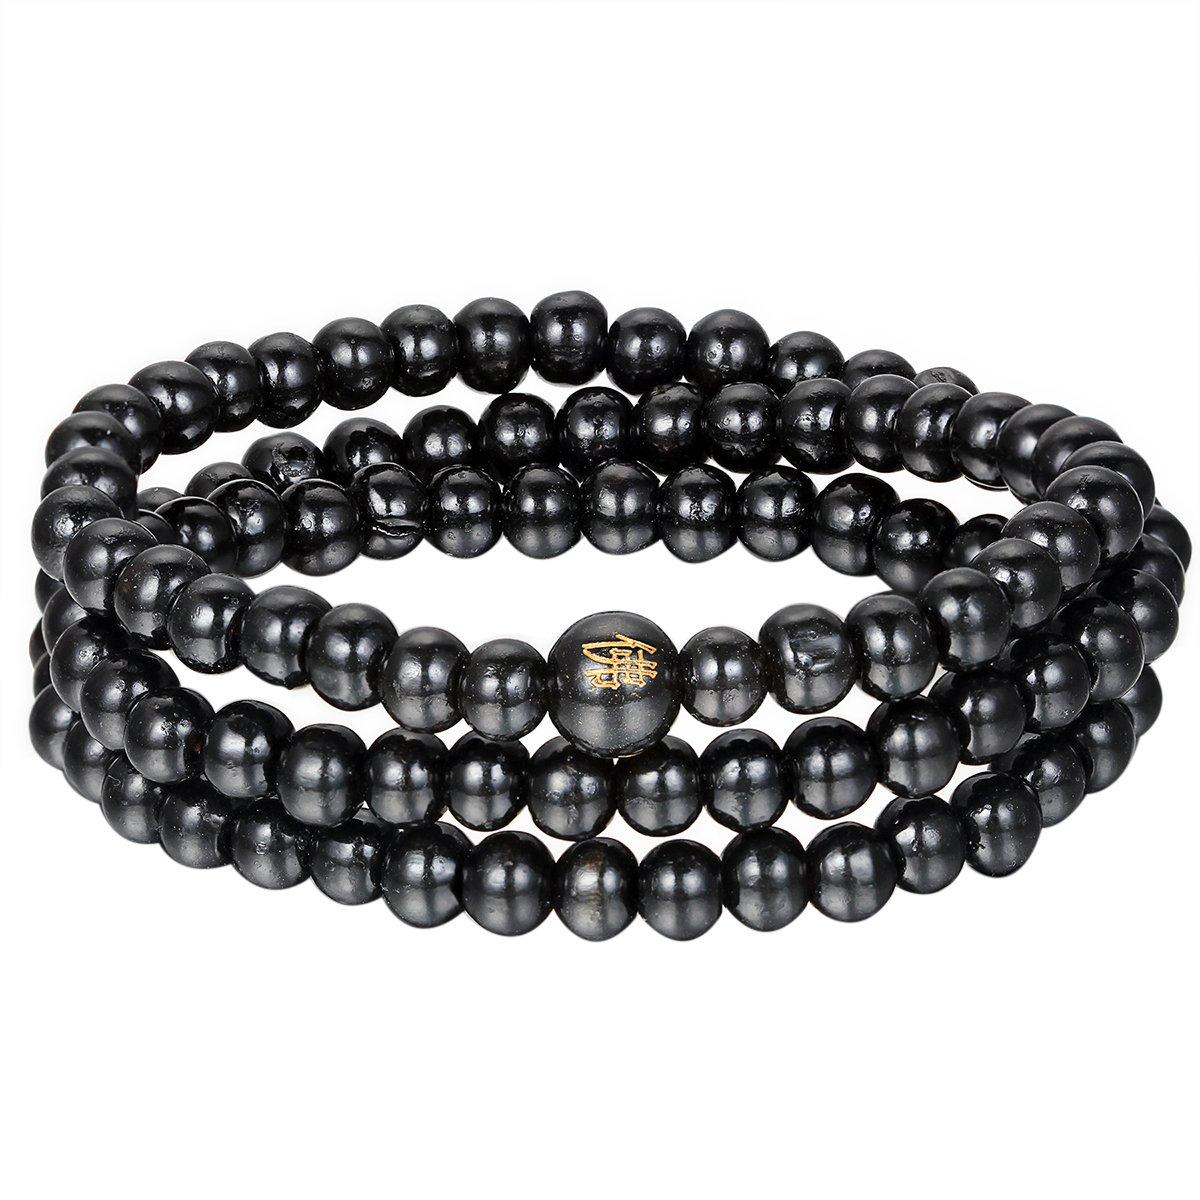 Herren Damen Wickelarmband Holz Perlen Armband Buddha Lange Armkette Armschmuck